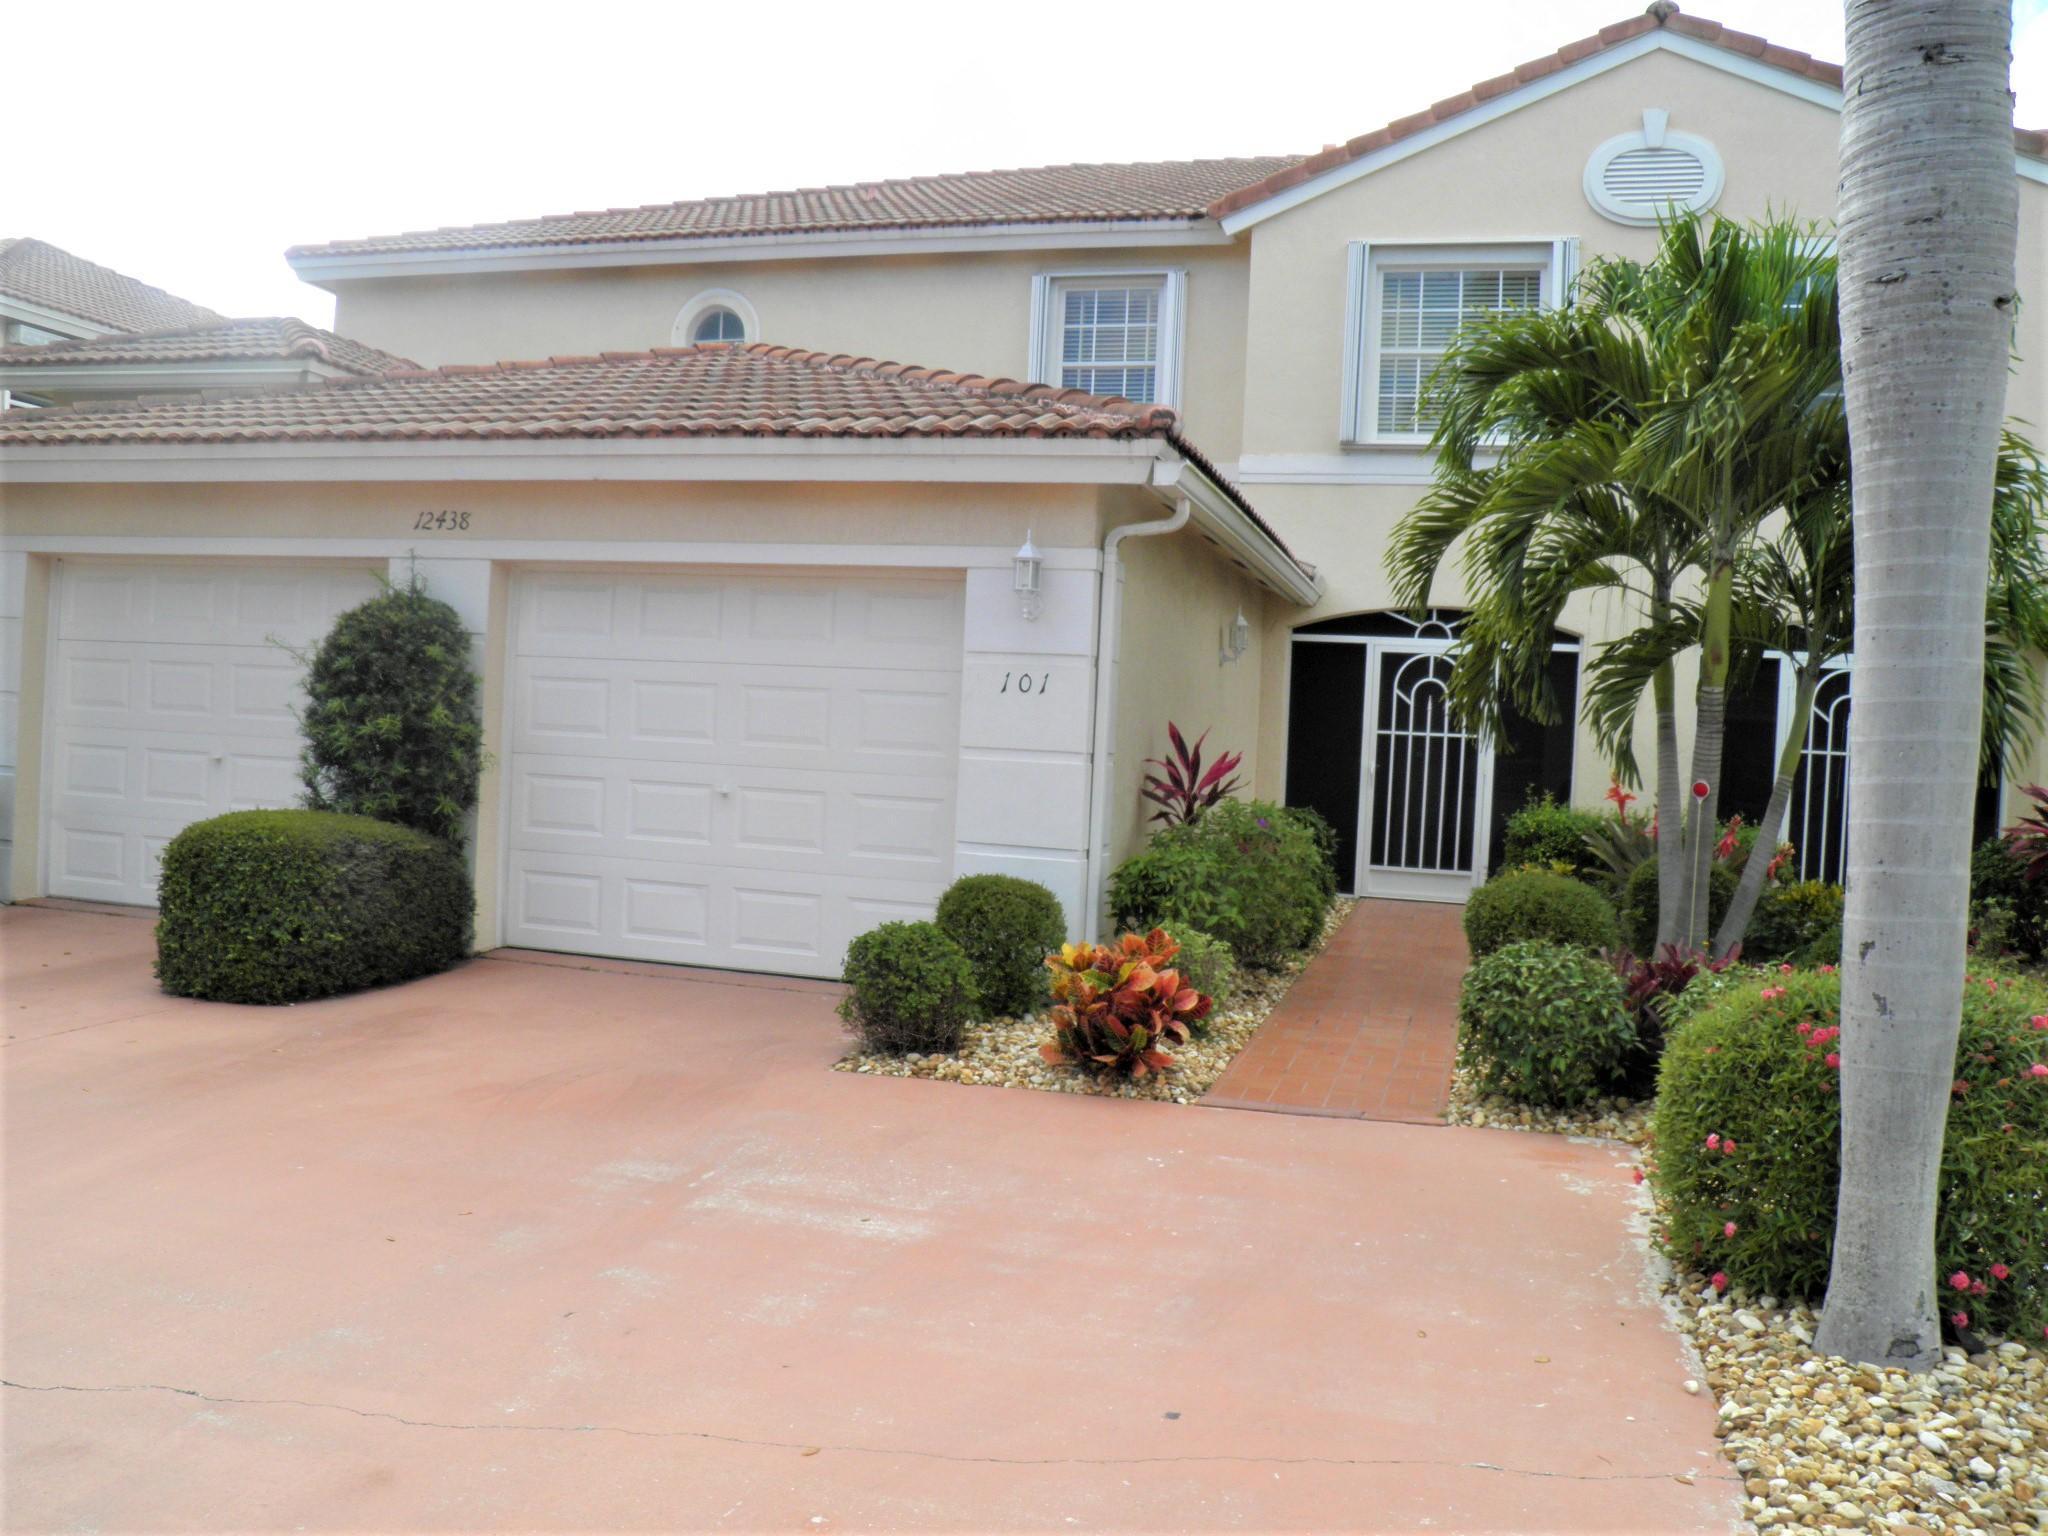 12438 Crystal Pointe Drive, Boynton Beach, FL 33437